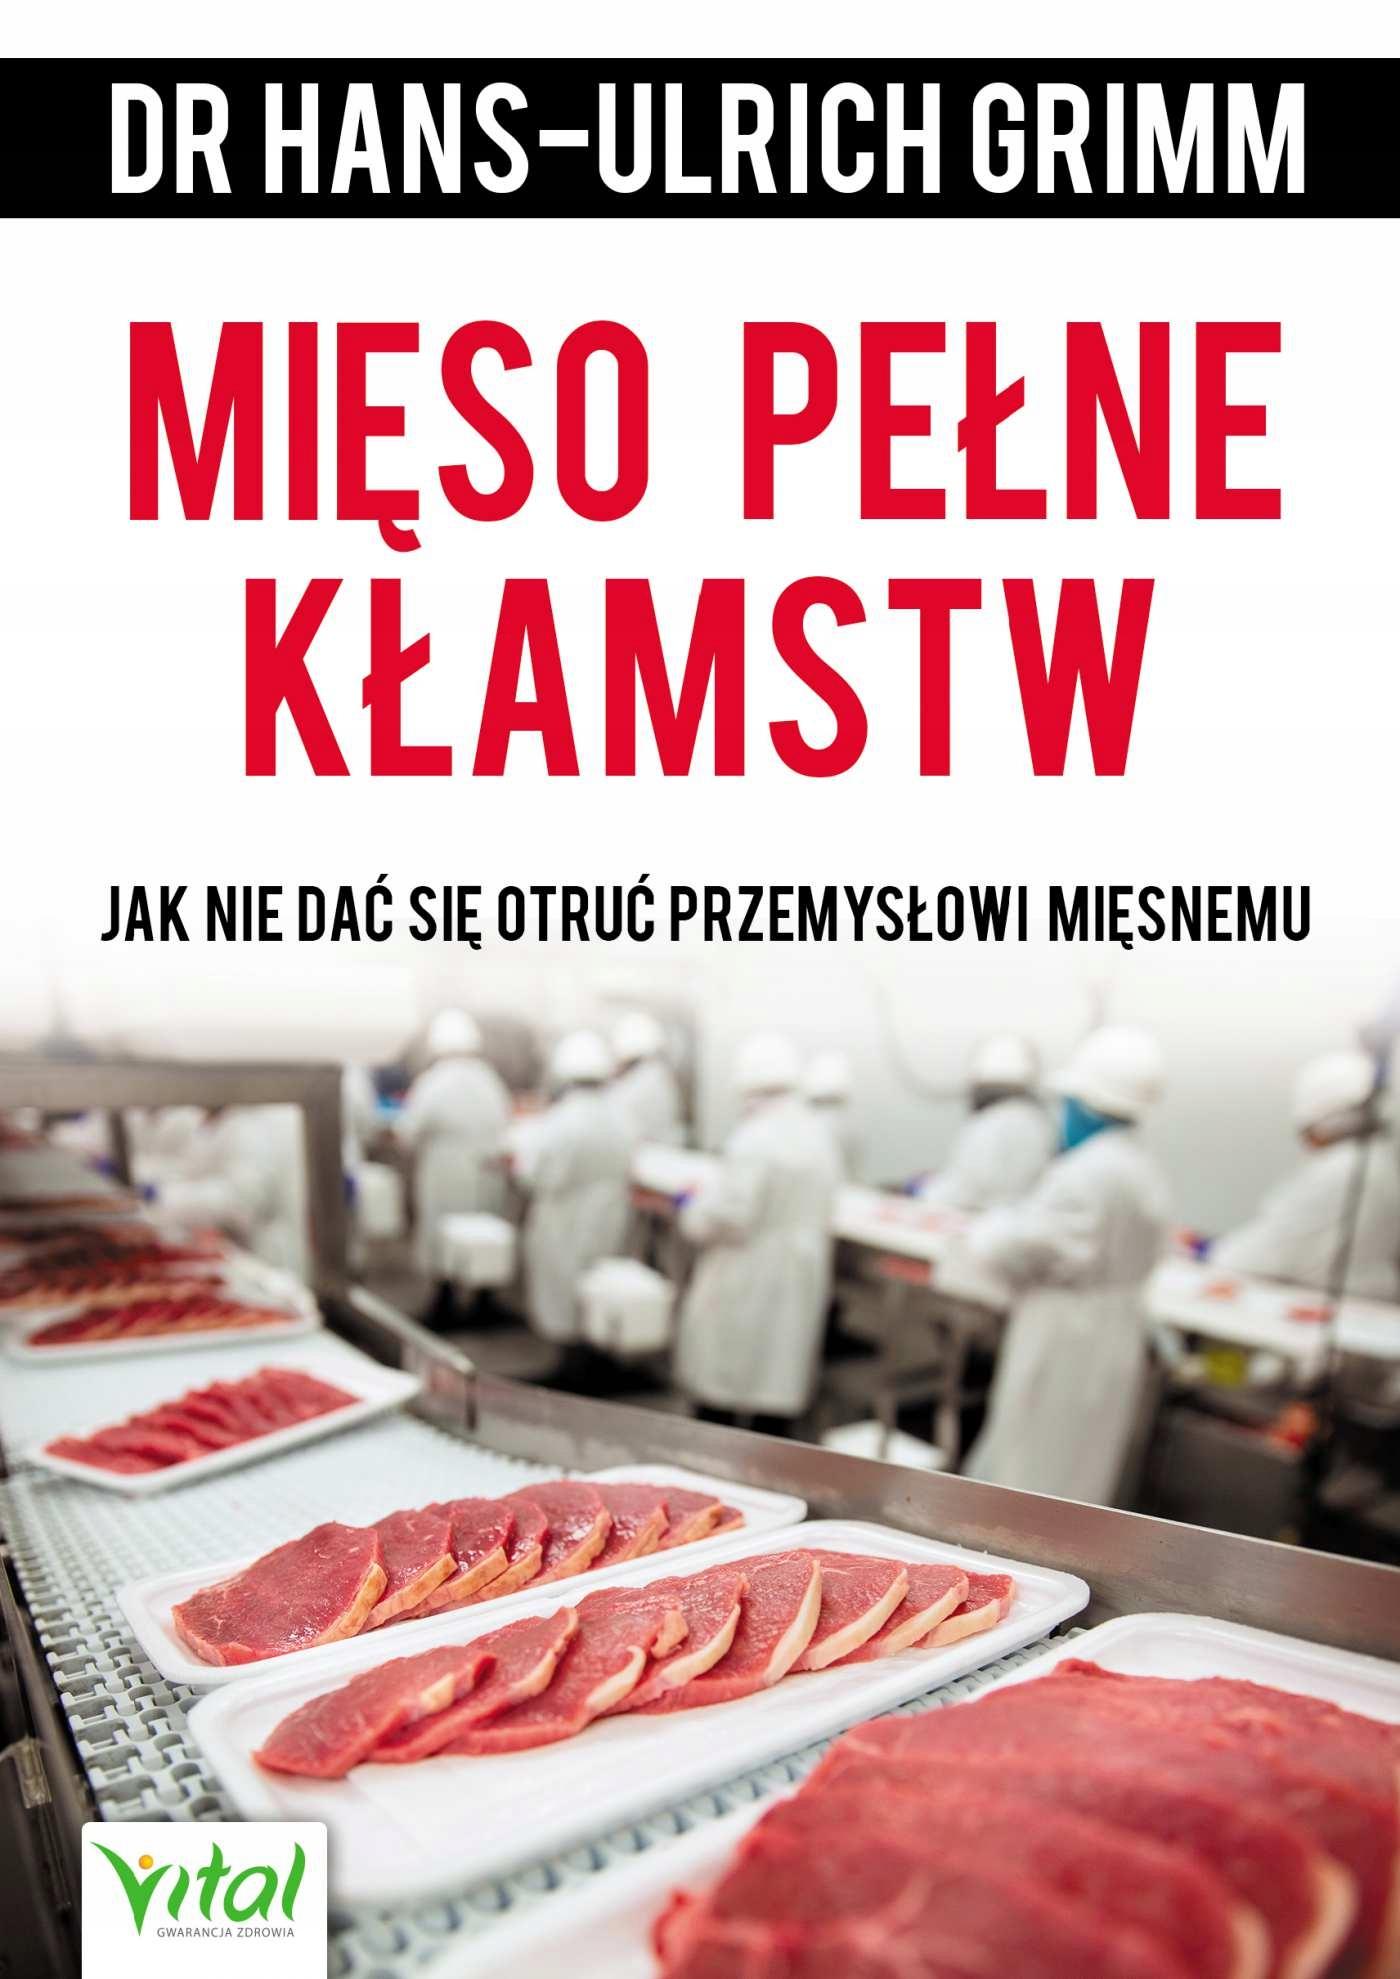 Mięso pełne kłamstw. Jak... dr Hans-Ulrich Grimm